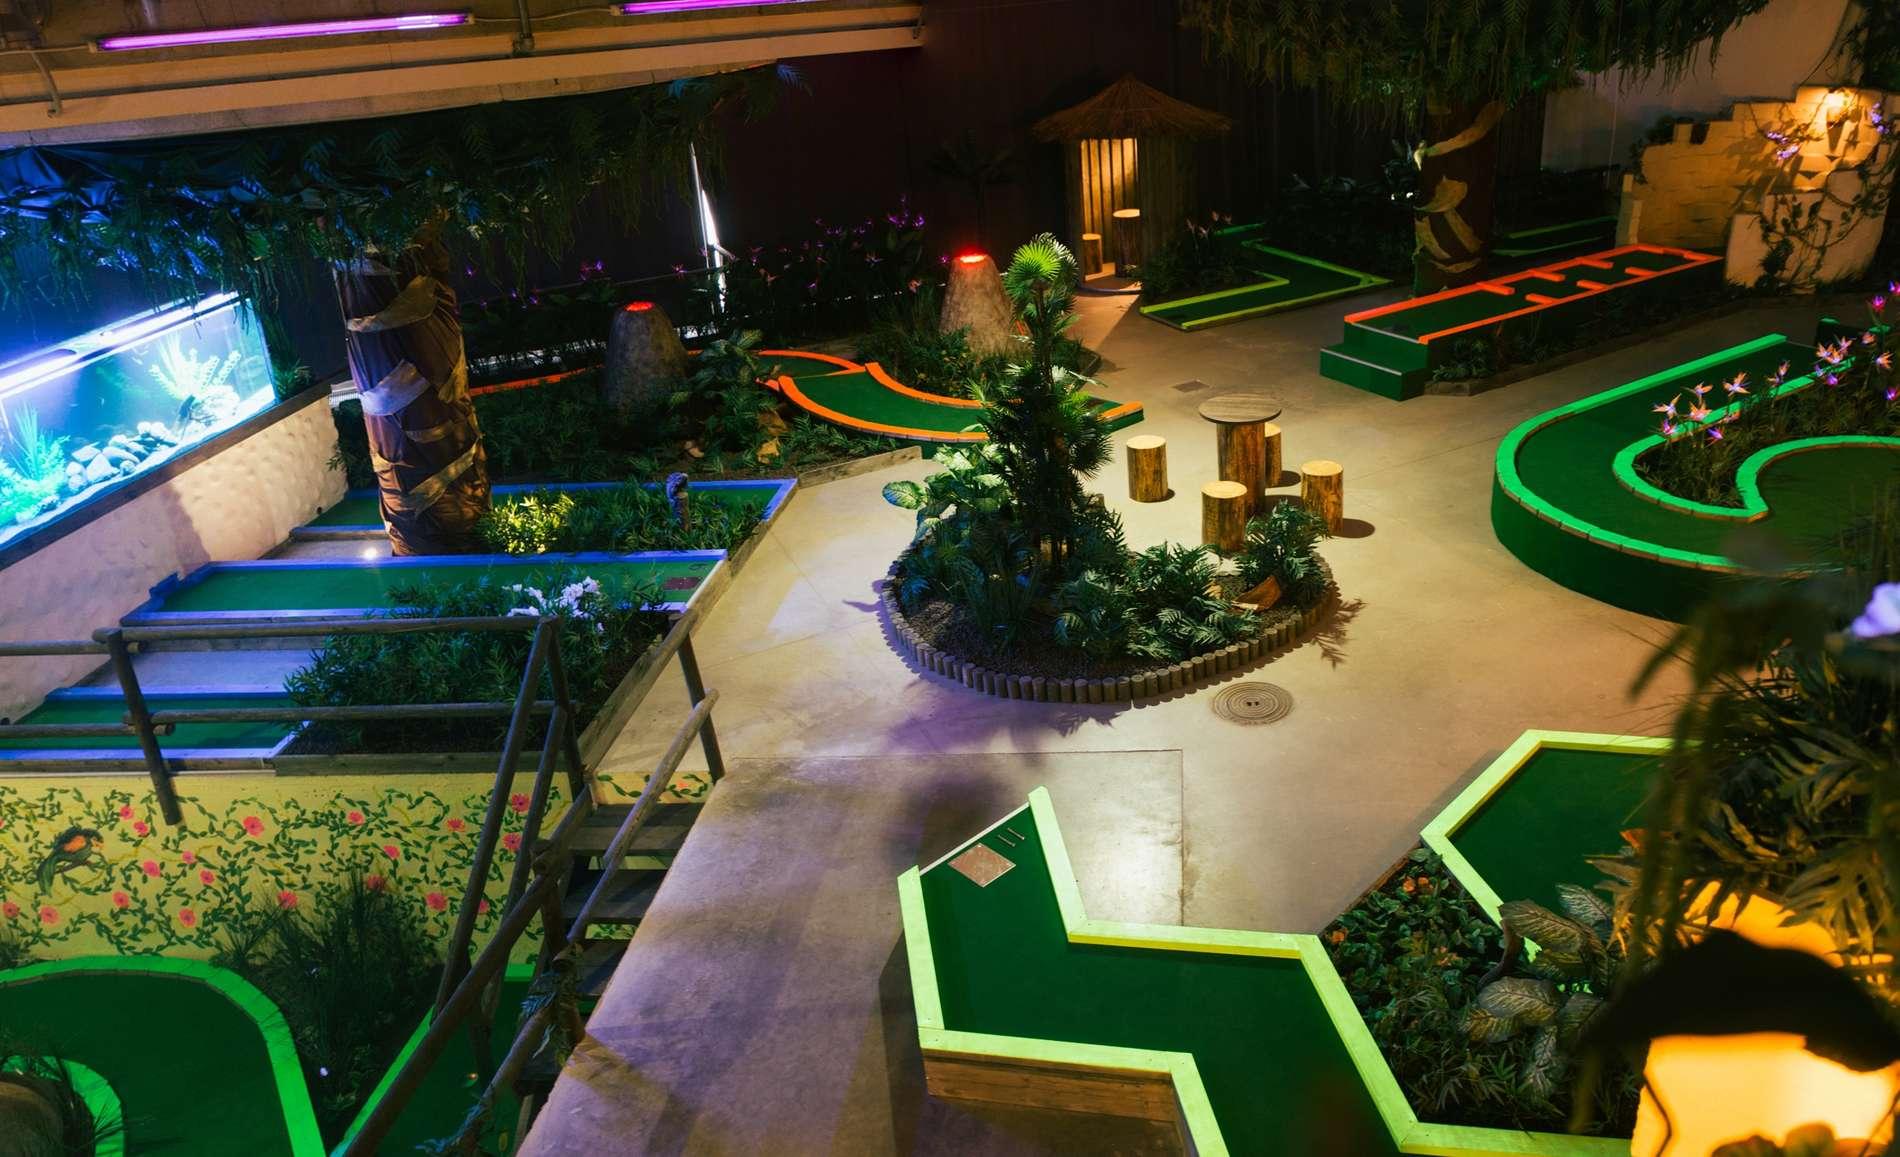 CityJungle Adventure Golf